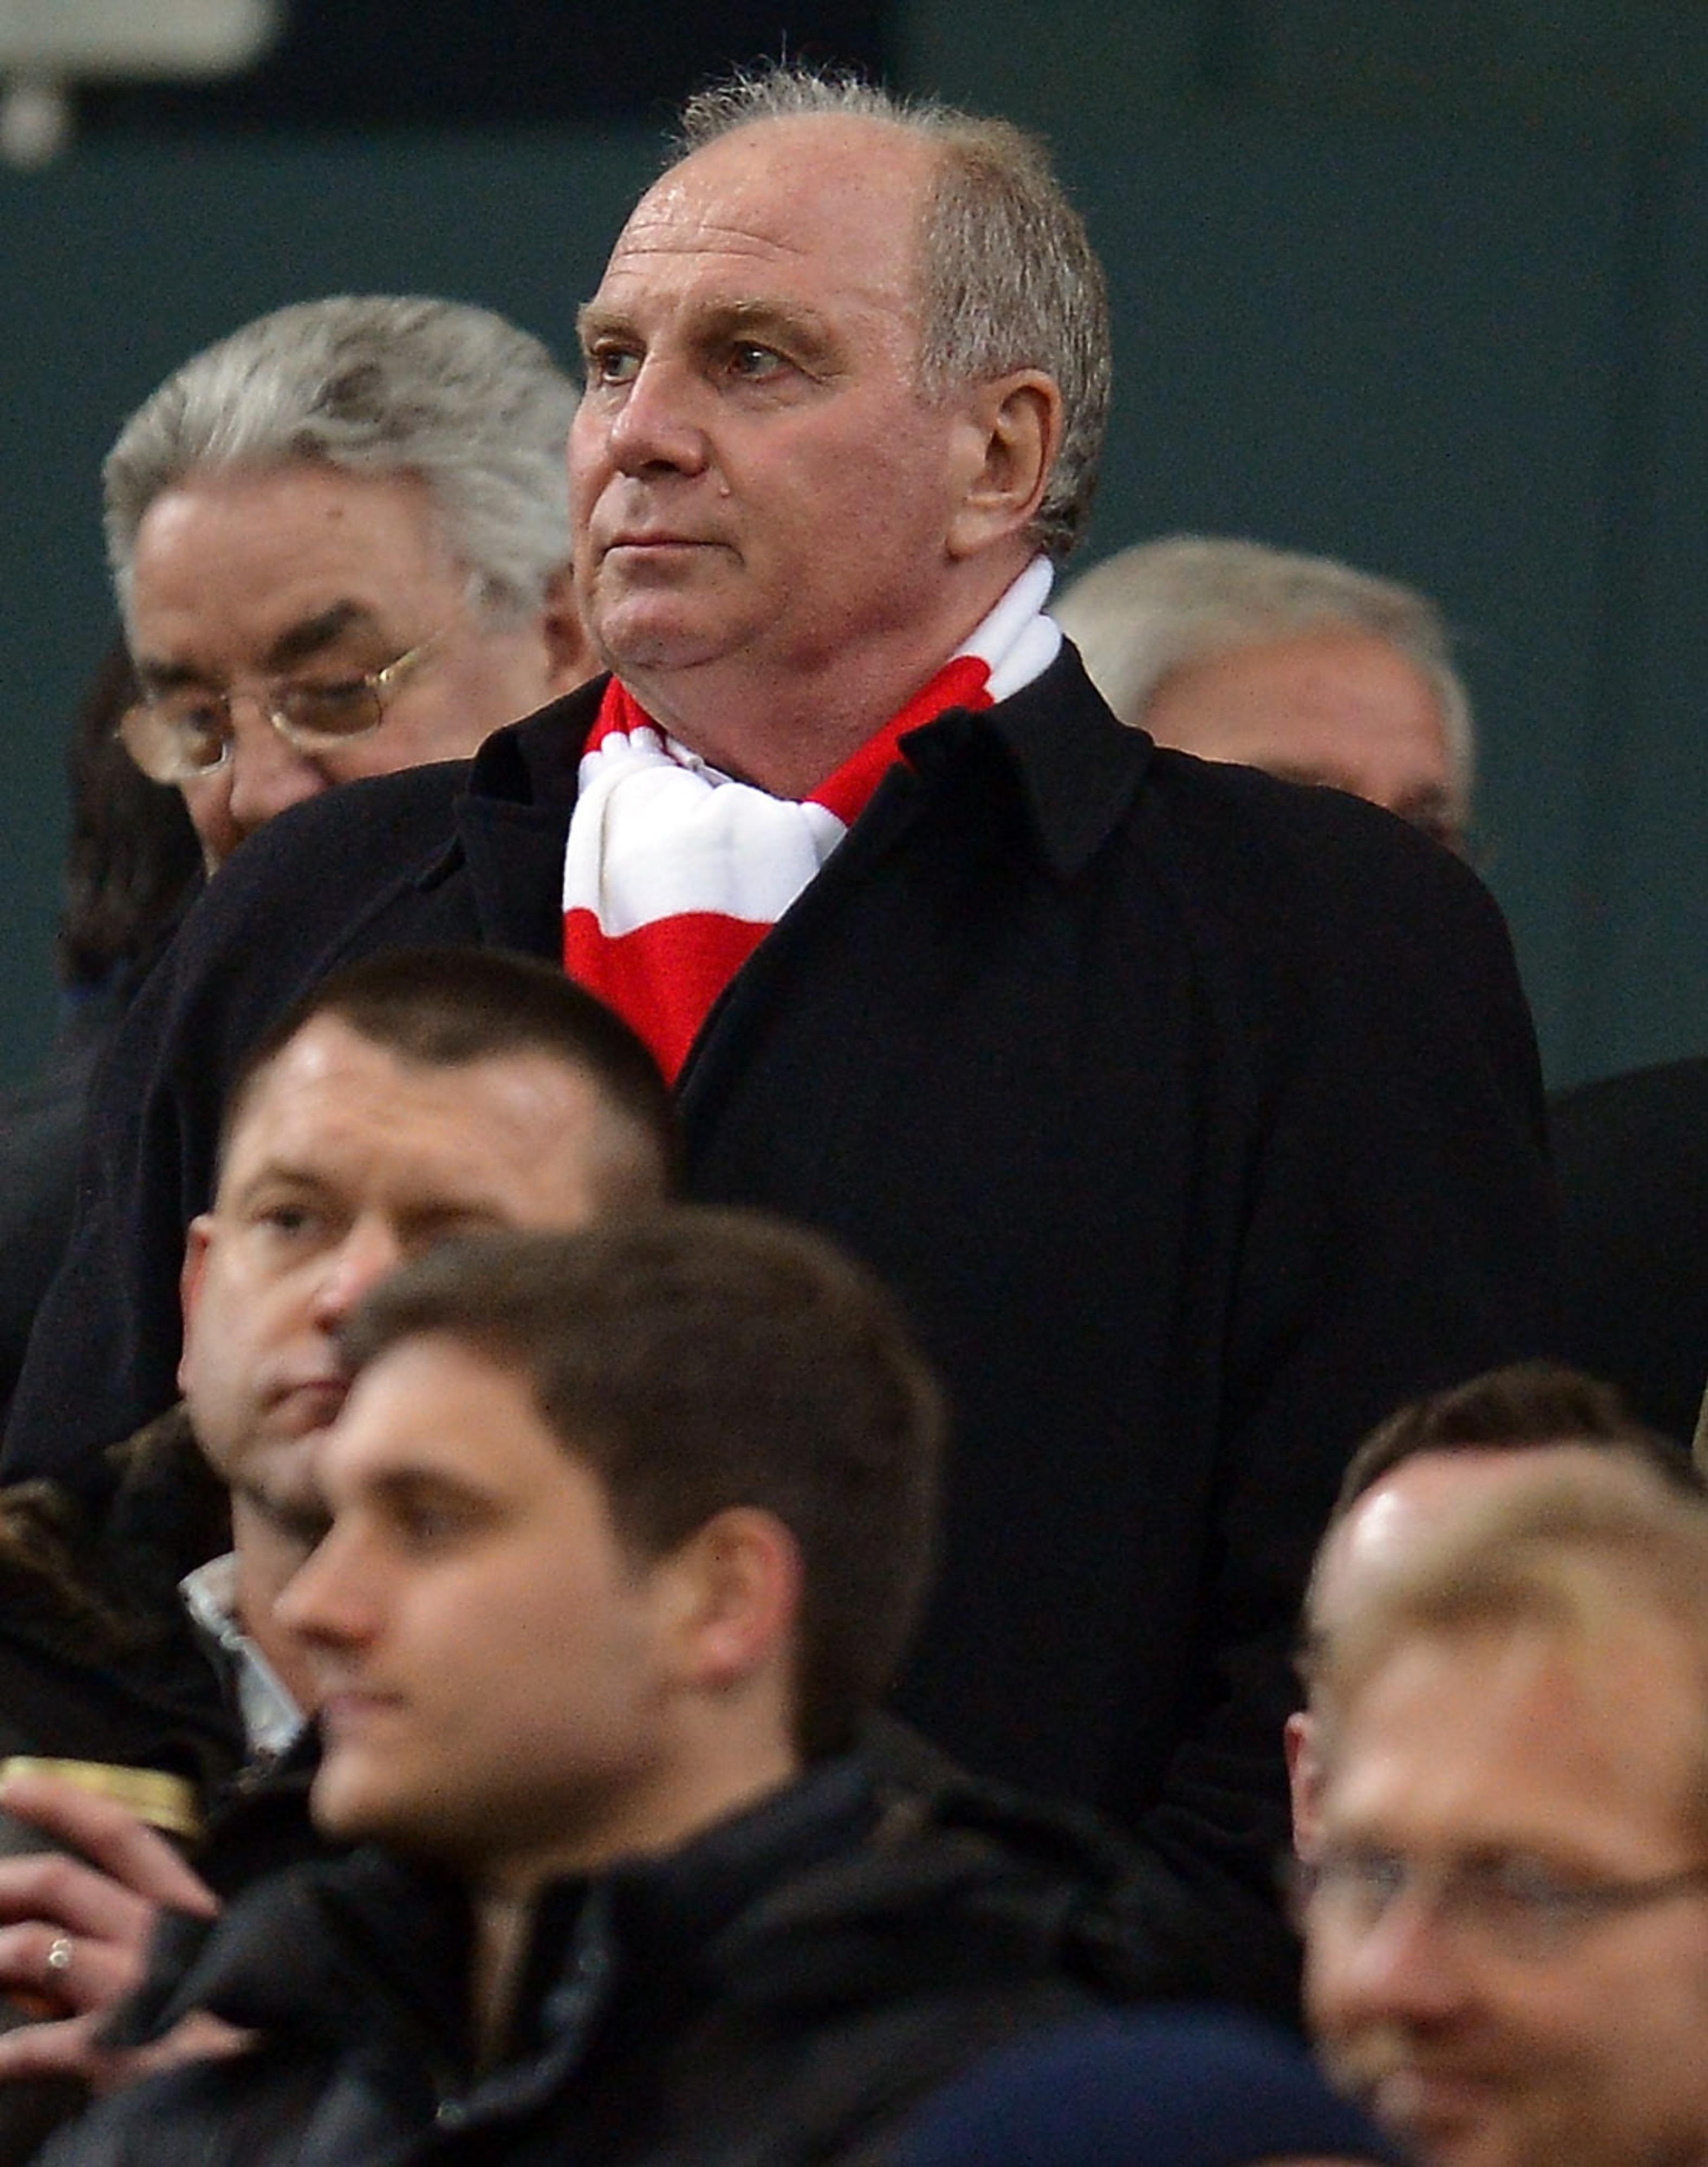 Bayern Munich president Uli Hoeneß sentenced to jail time for tax evasion